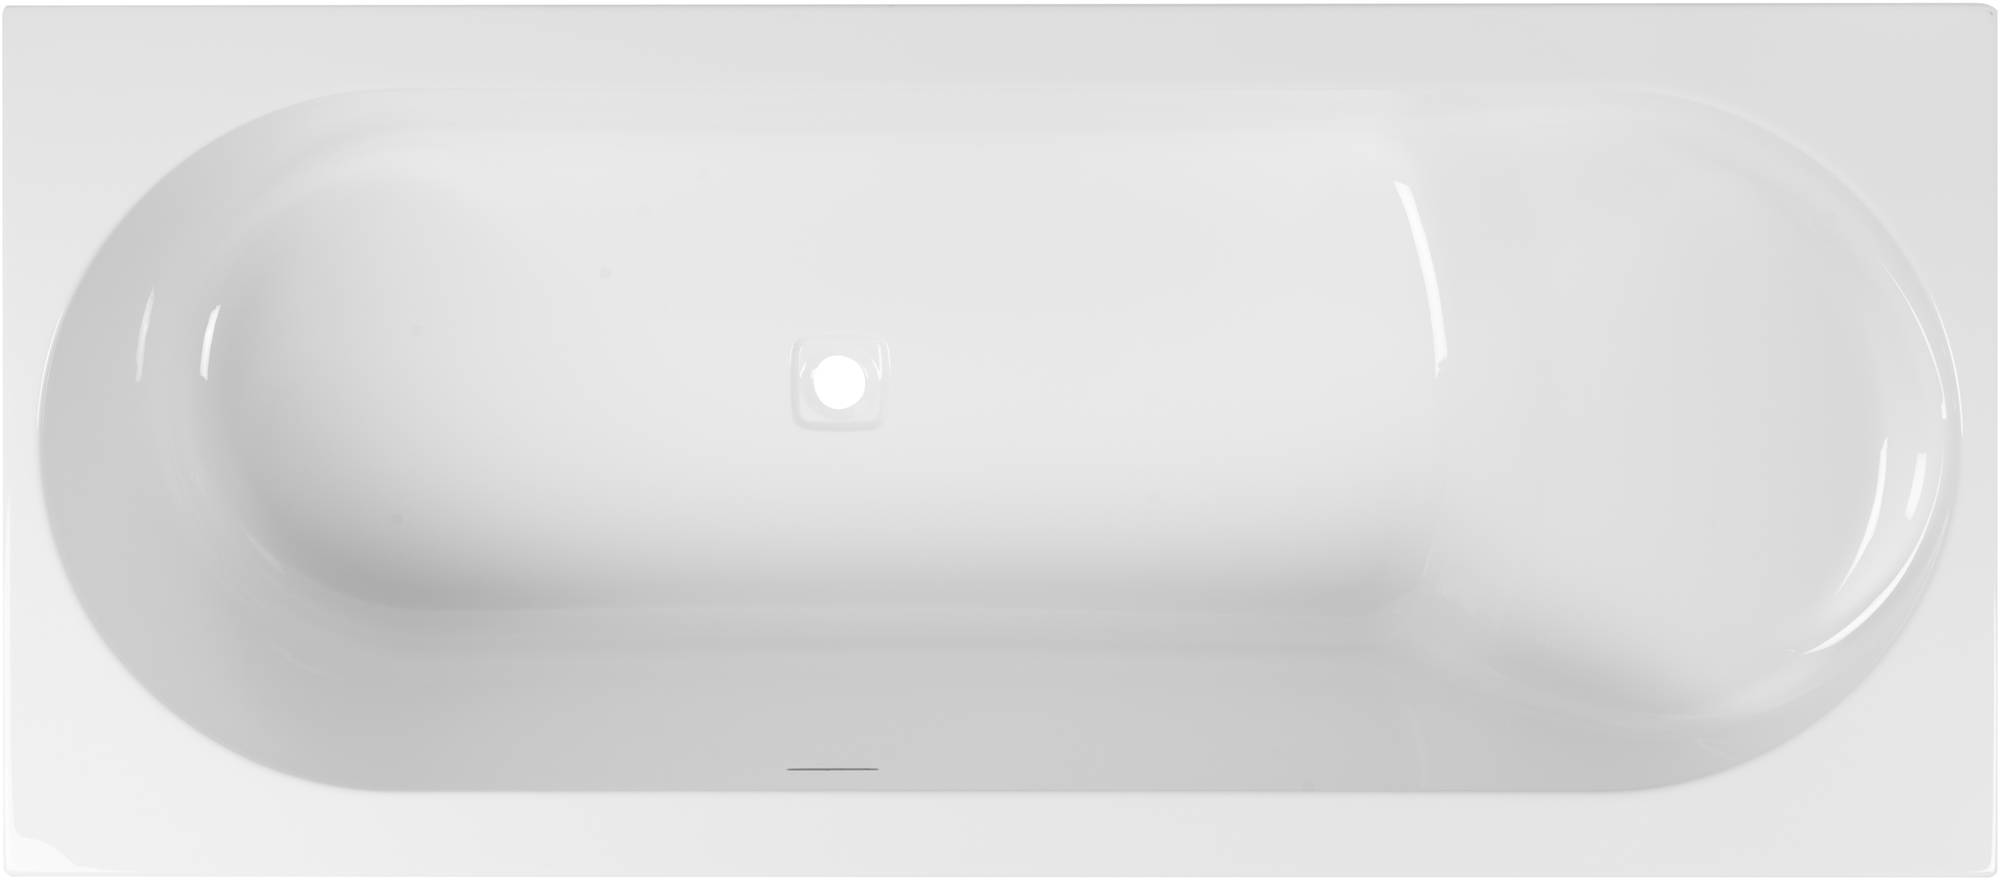 Ben Cenelio Design Bad 180x80x65 cm Rechts Glans Wit